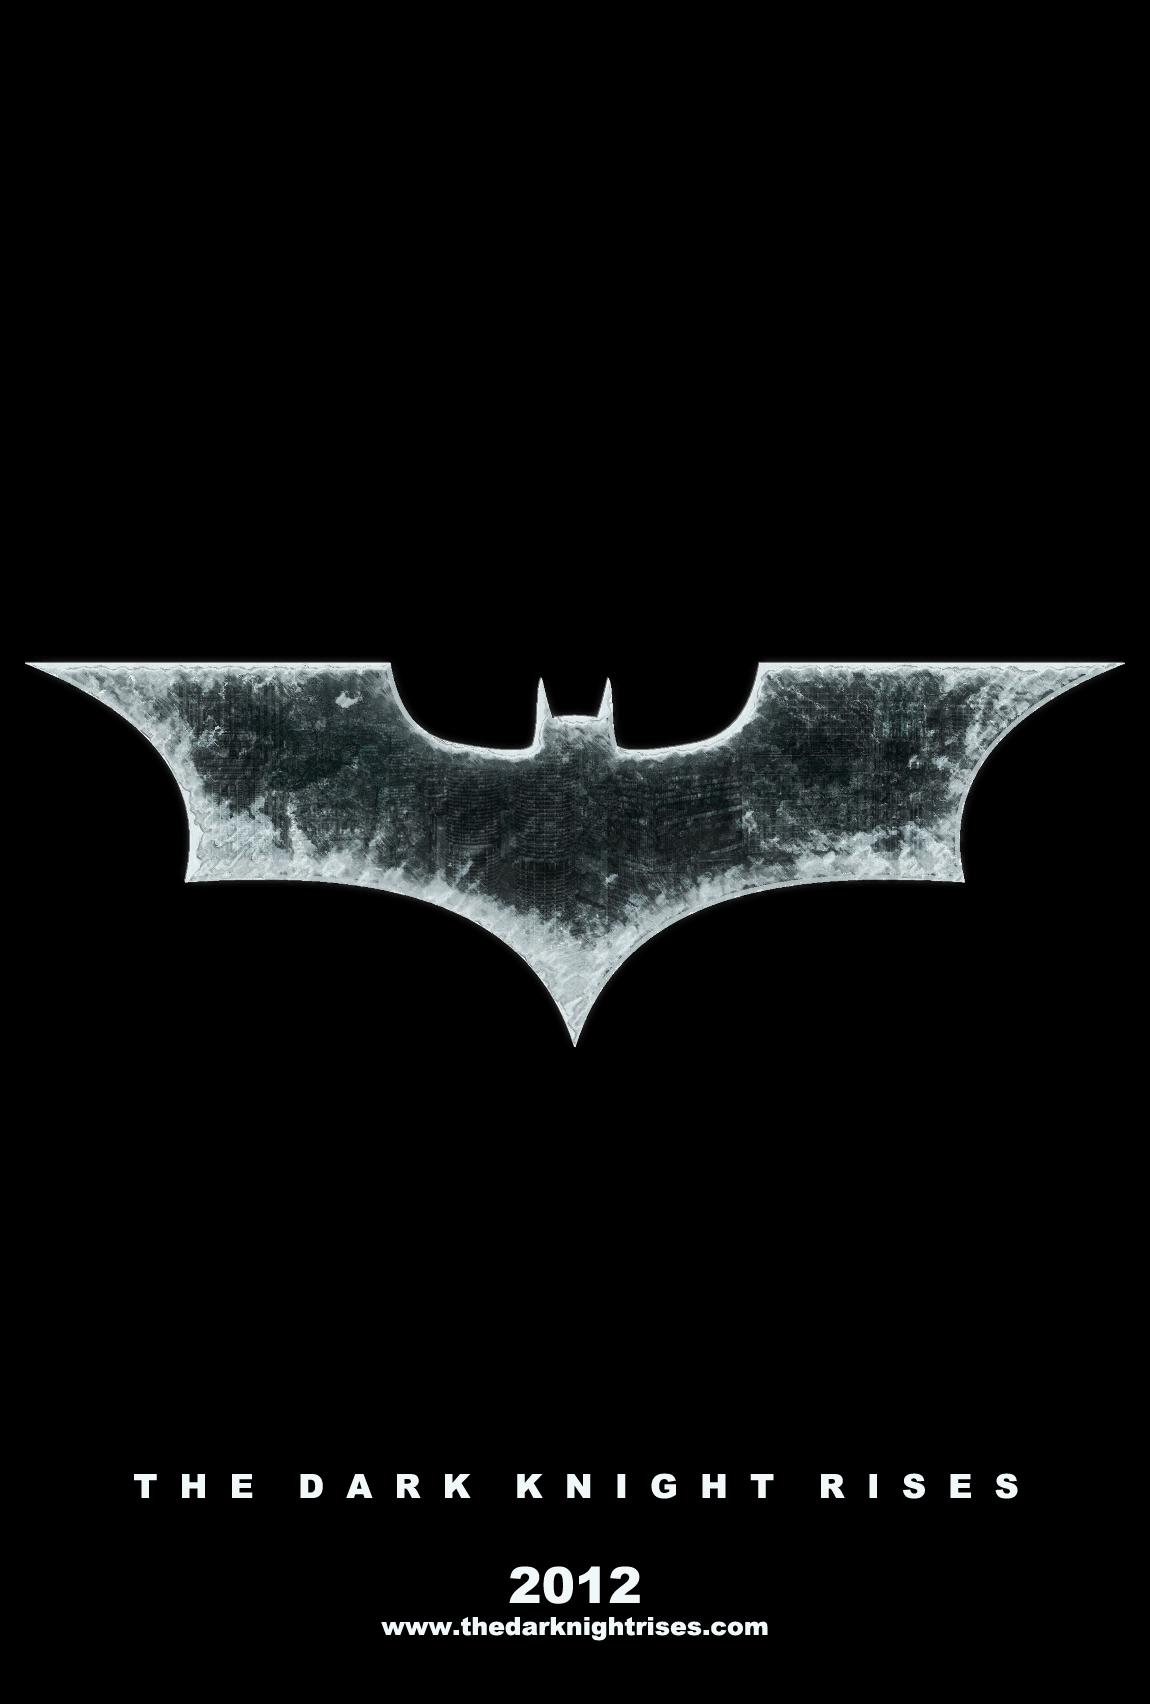 The Dark Knight Rises Poster By Pk Enterprises On Deviantart